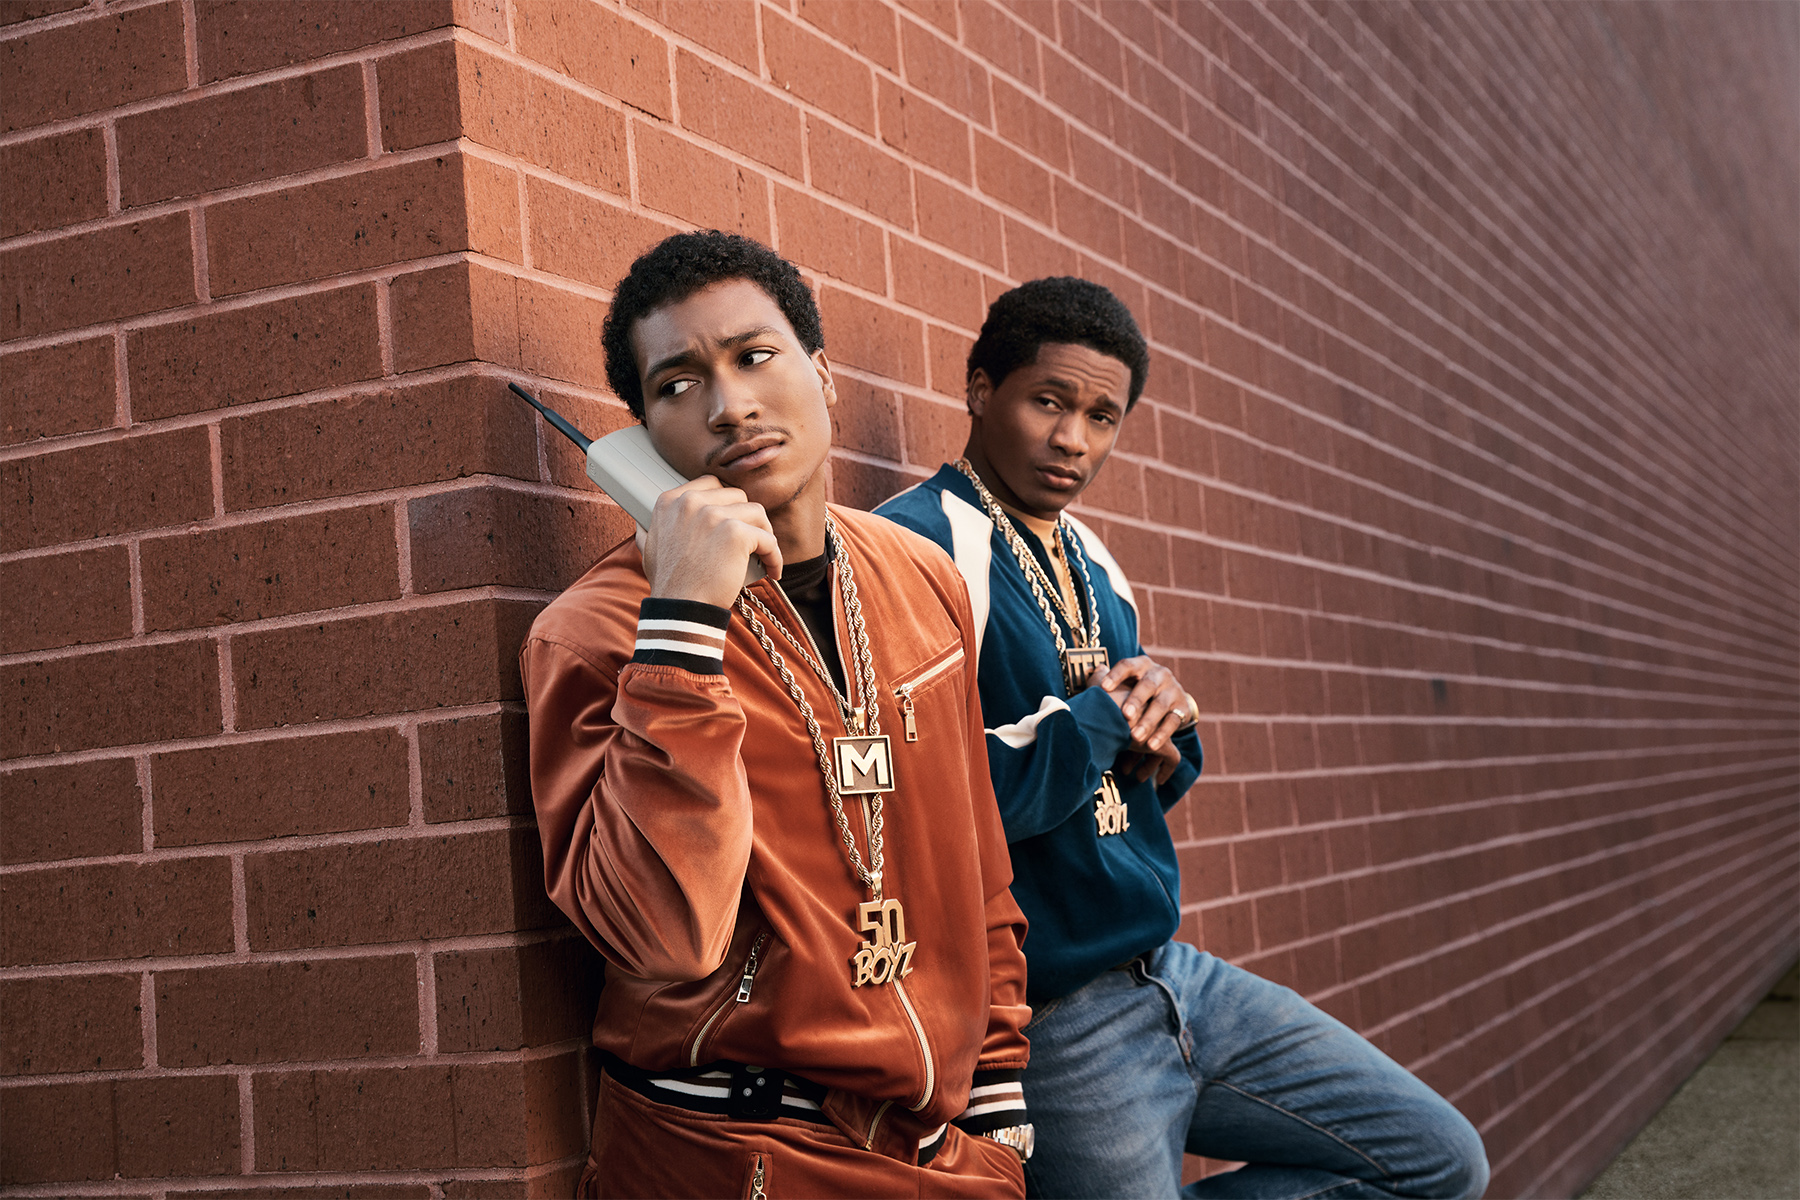 Demetrius Flenory Jr. and Da'Vinchi star in 'BMF'